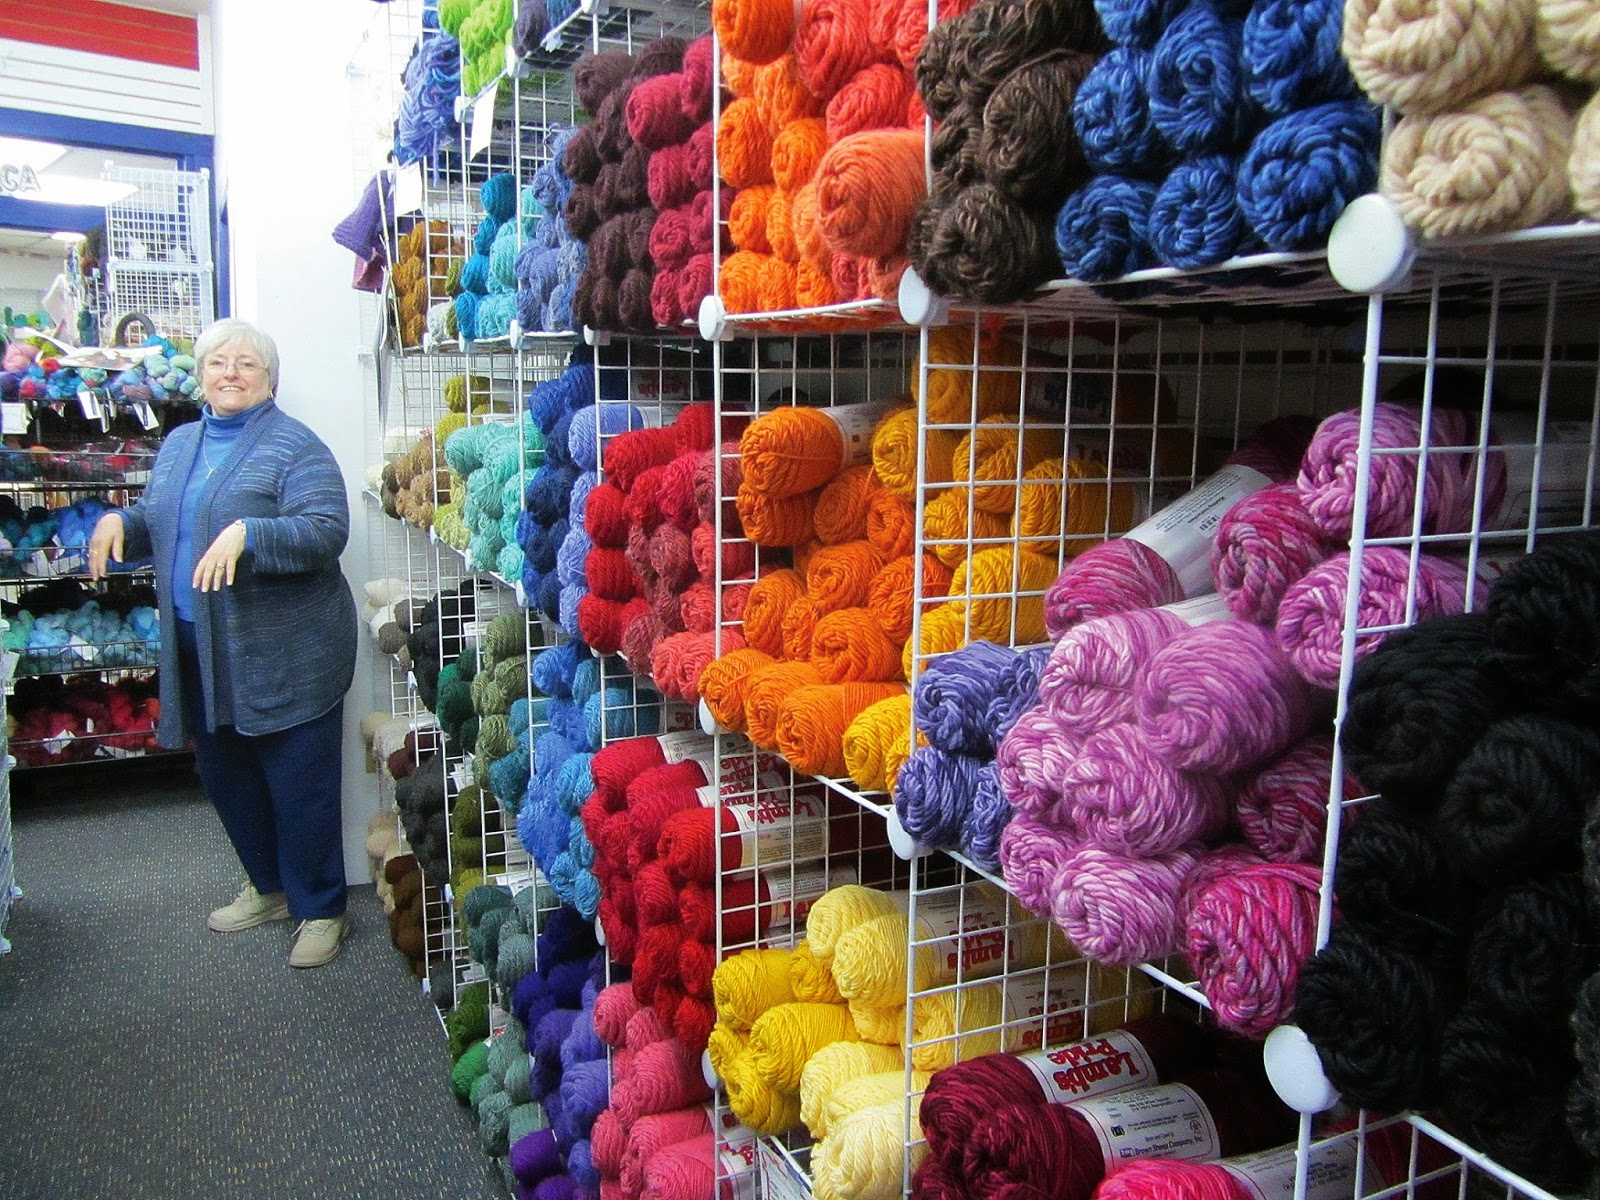 Rosemary's Gift and Yarn Shop image 4